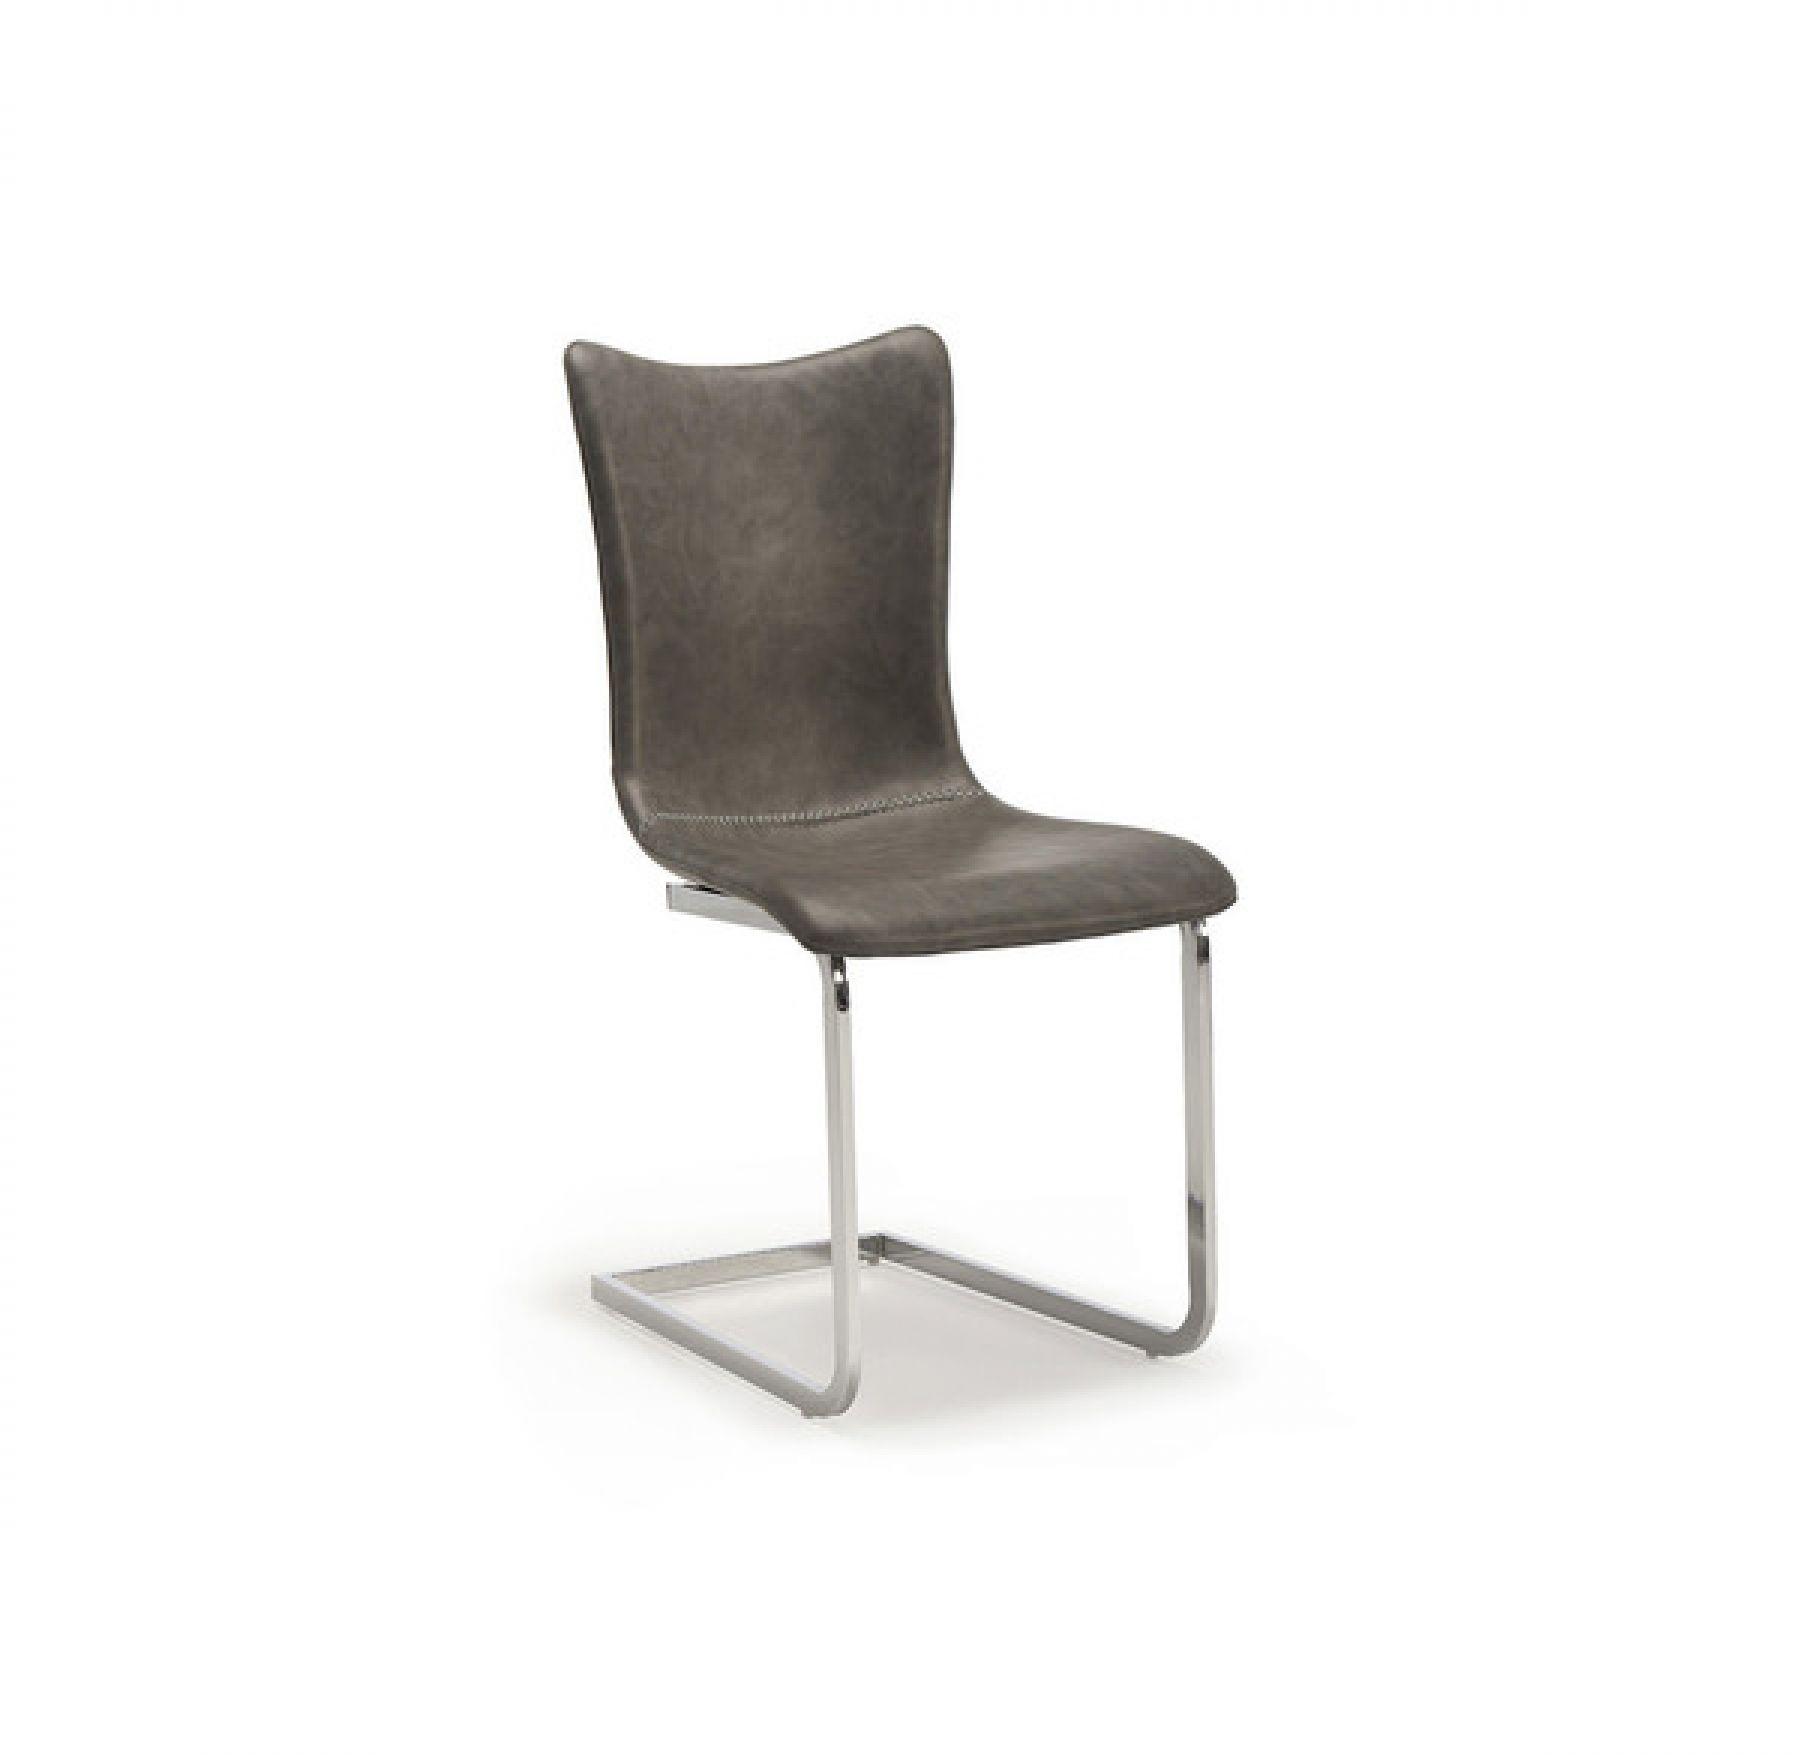 Strange Alisa Chair With Sleigh Chrome Legs Spiritservingveterans Wood Chair Design Ideas Spiritservingveteransorg